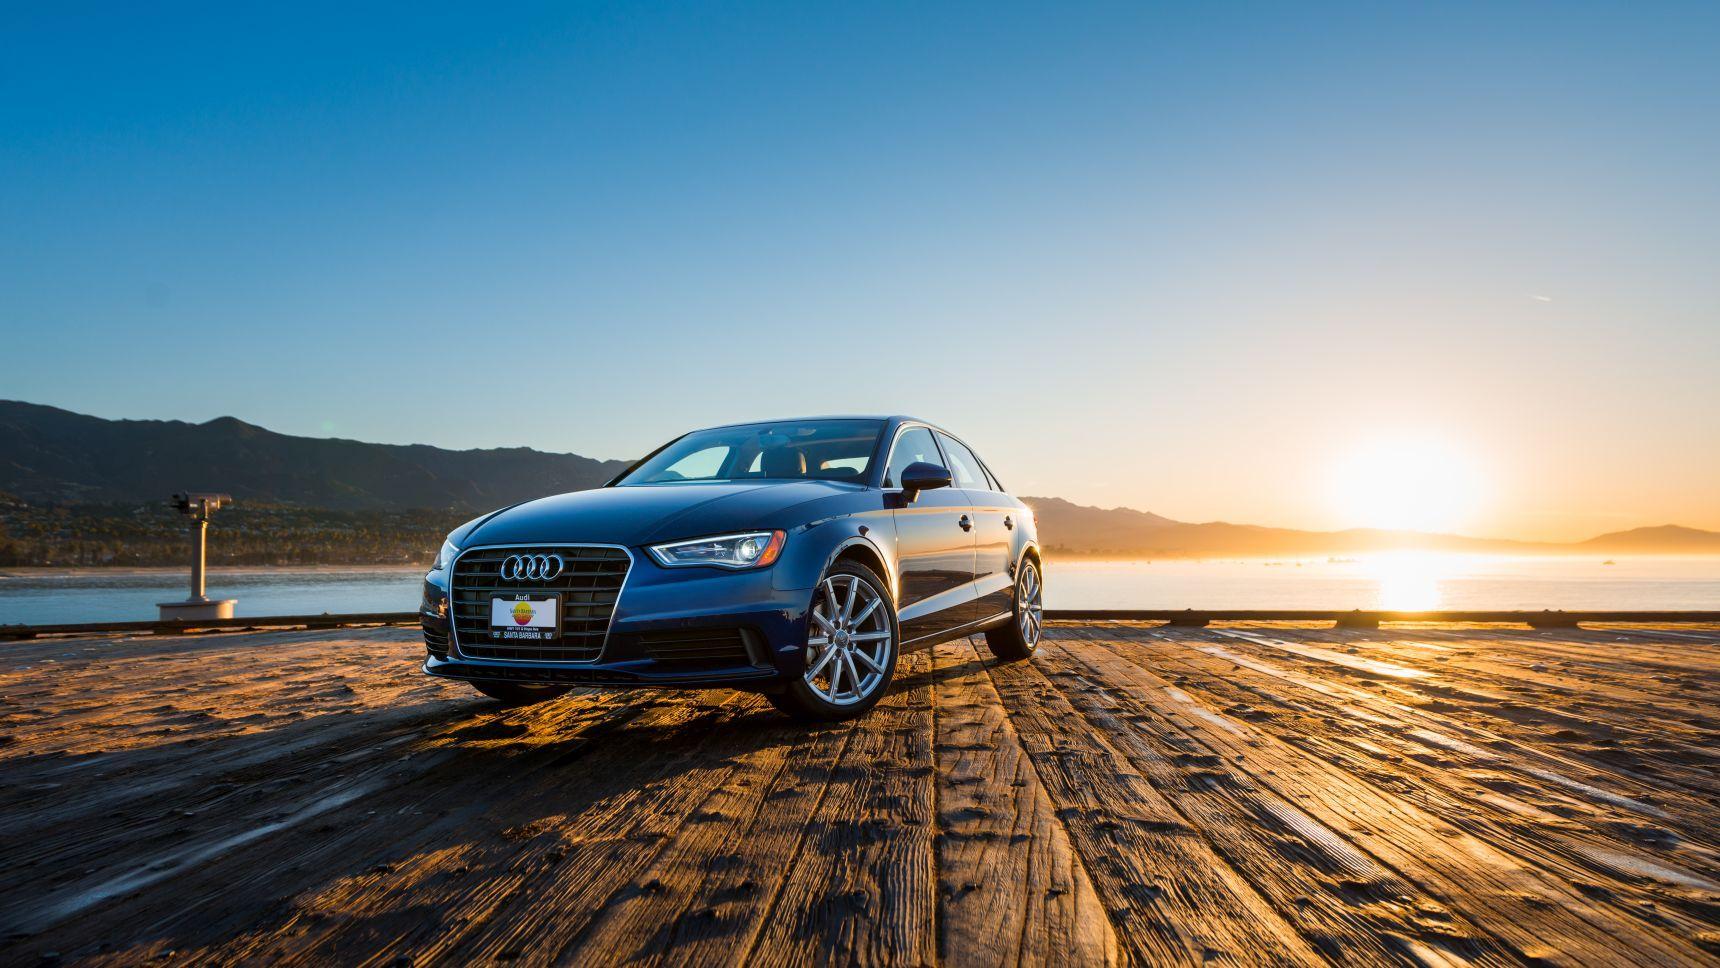 Santa Barbara Auto Group Blog Luxury Dealers Near Goleta Audi Audi Cars Automotive News